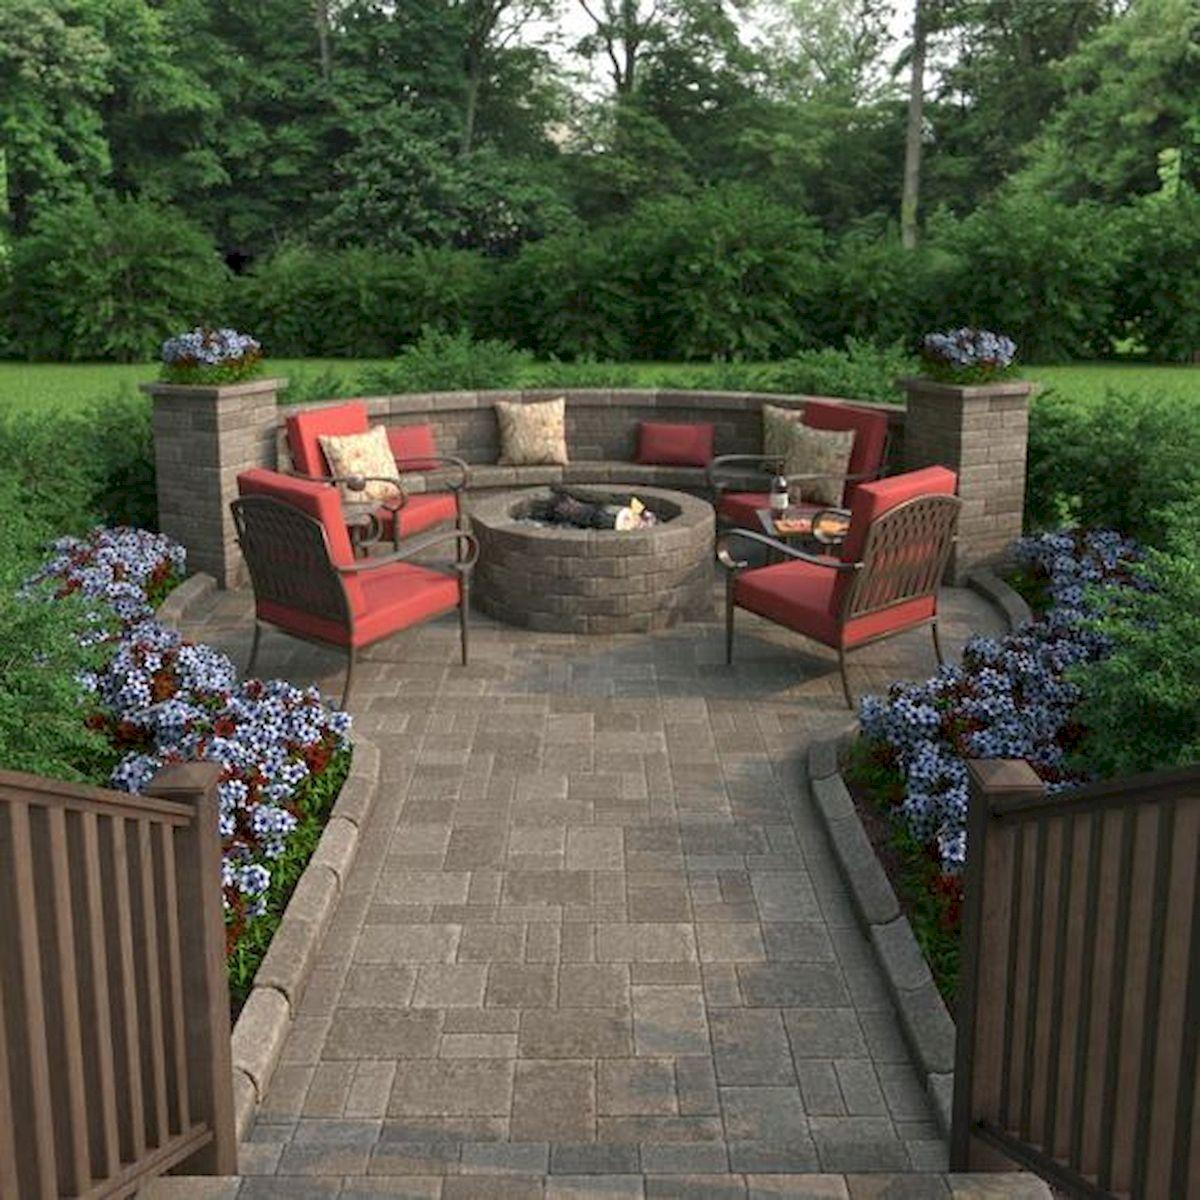 50 Fantastic Backyard Patio and Decking Design Ideas (35)